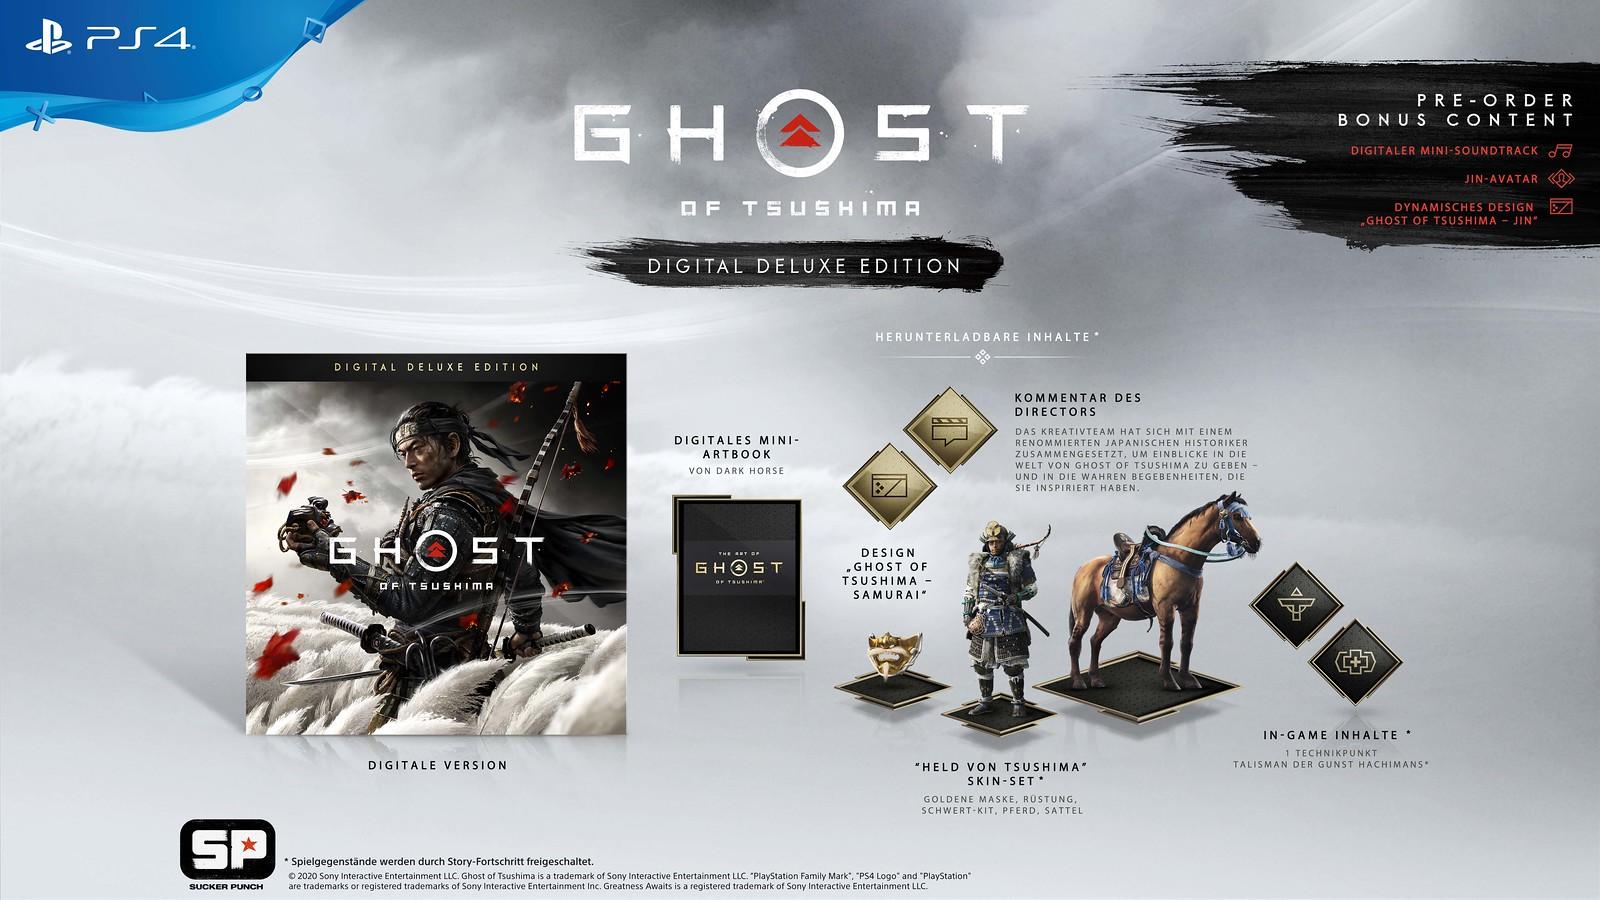 49622736422 0b9cf2c0b7 h - Ghost of Tsushima erscheint am 26. Juni: Collector's & Digital Deluxe Edition im Detail